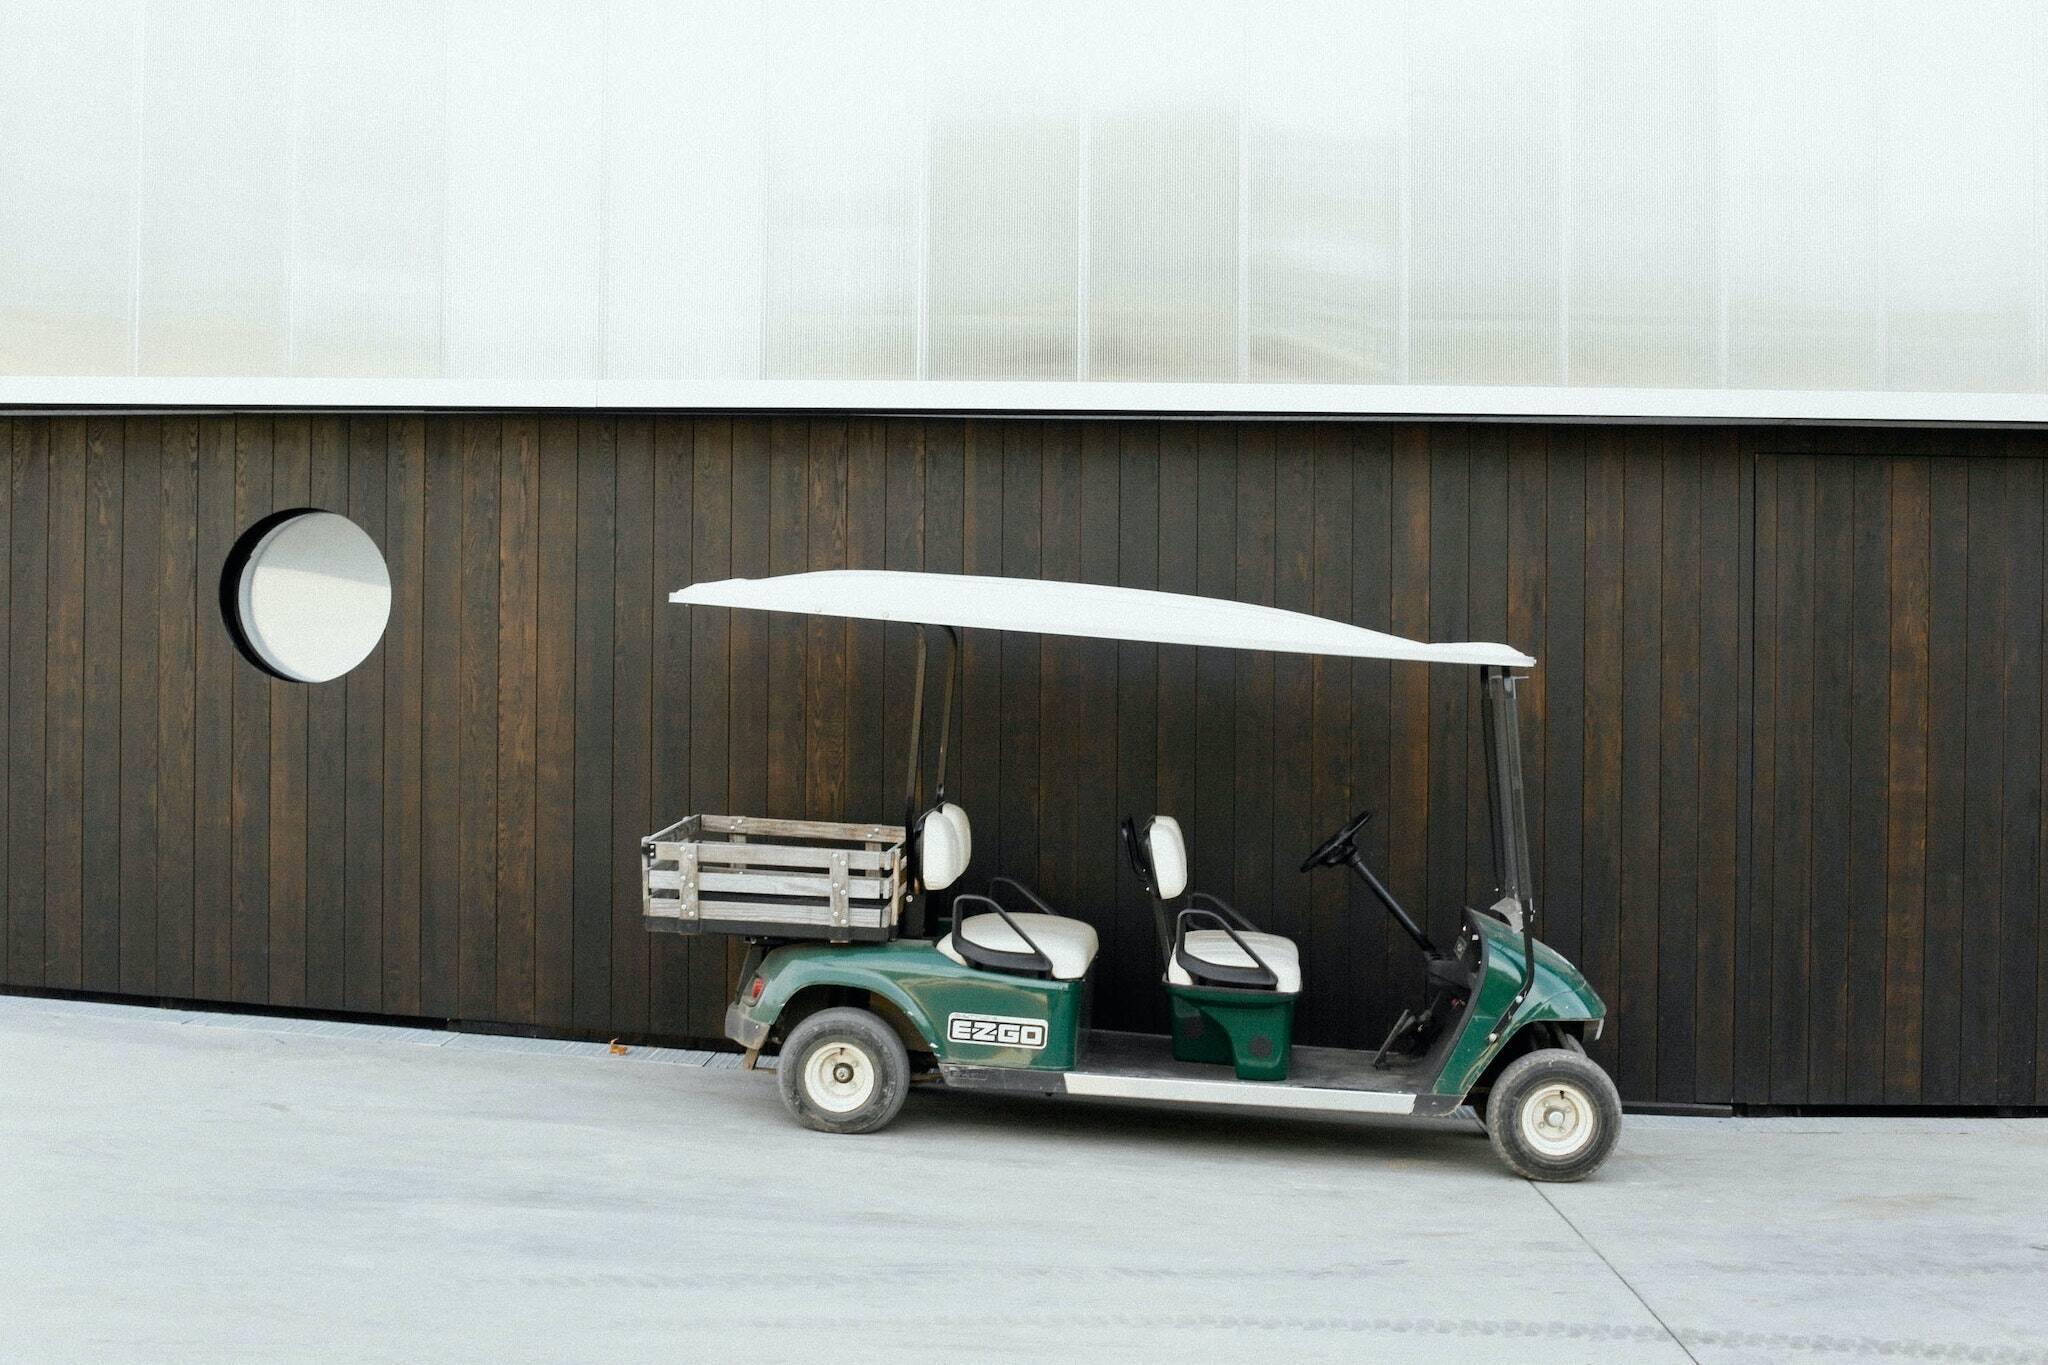 golf cart on qew